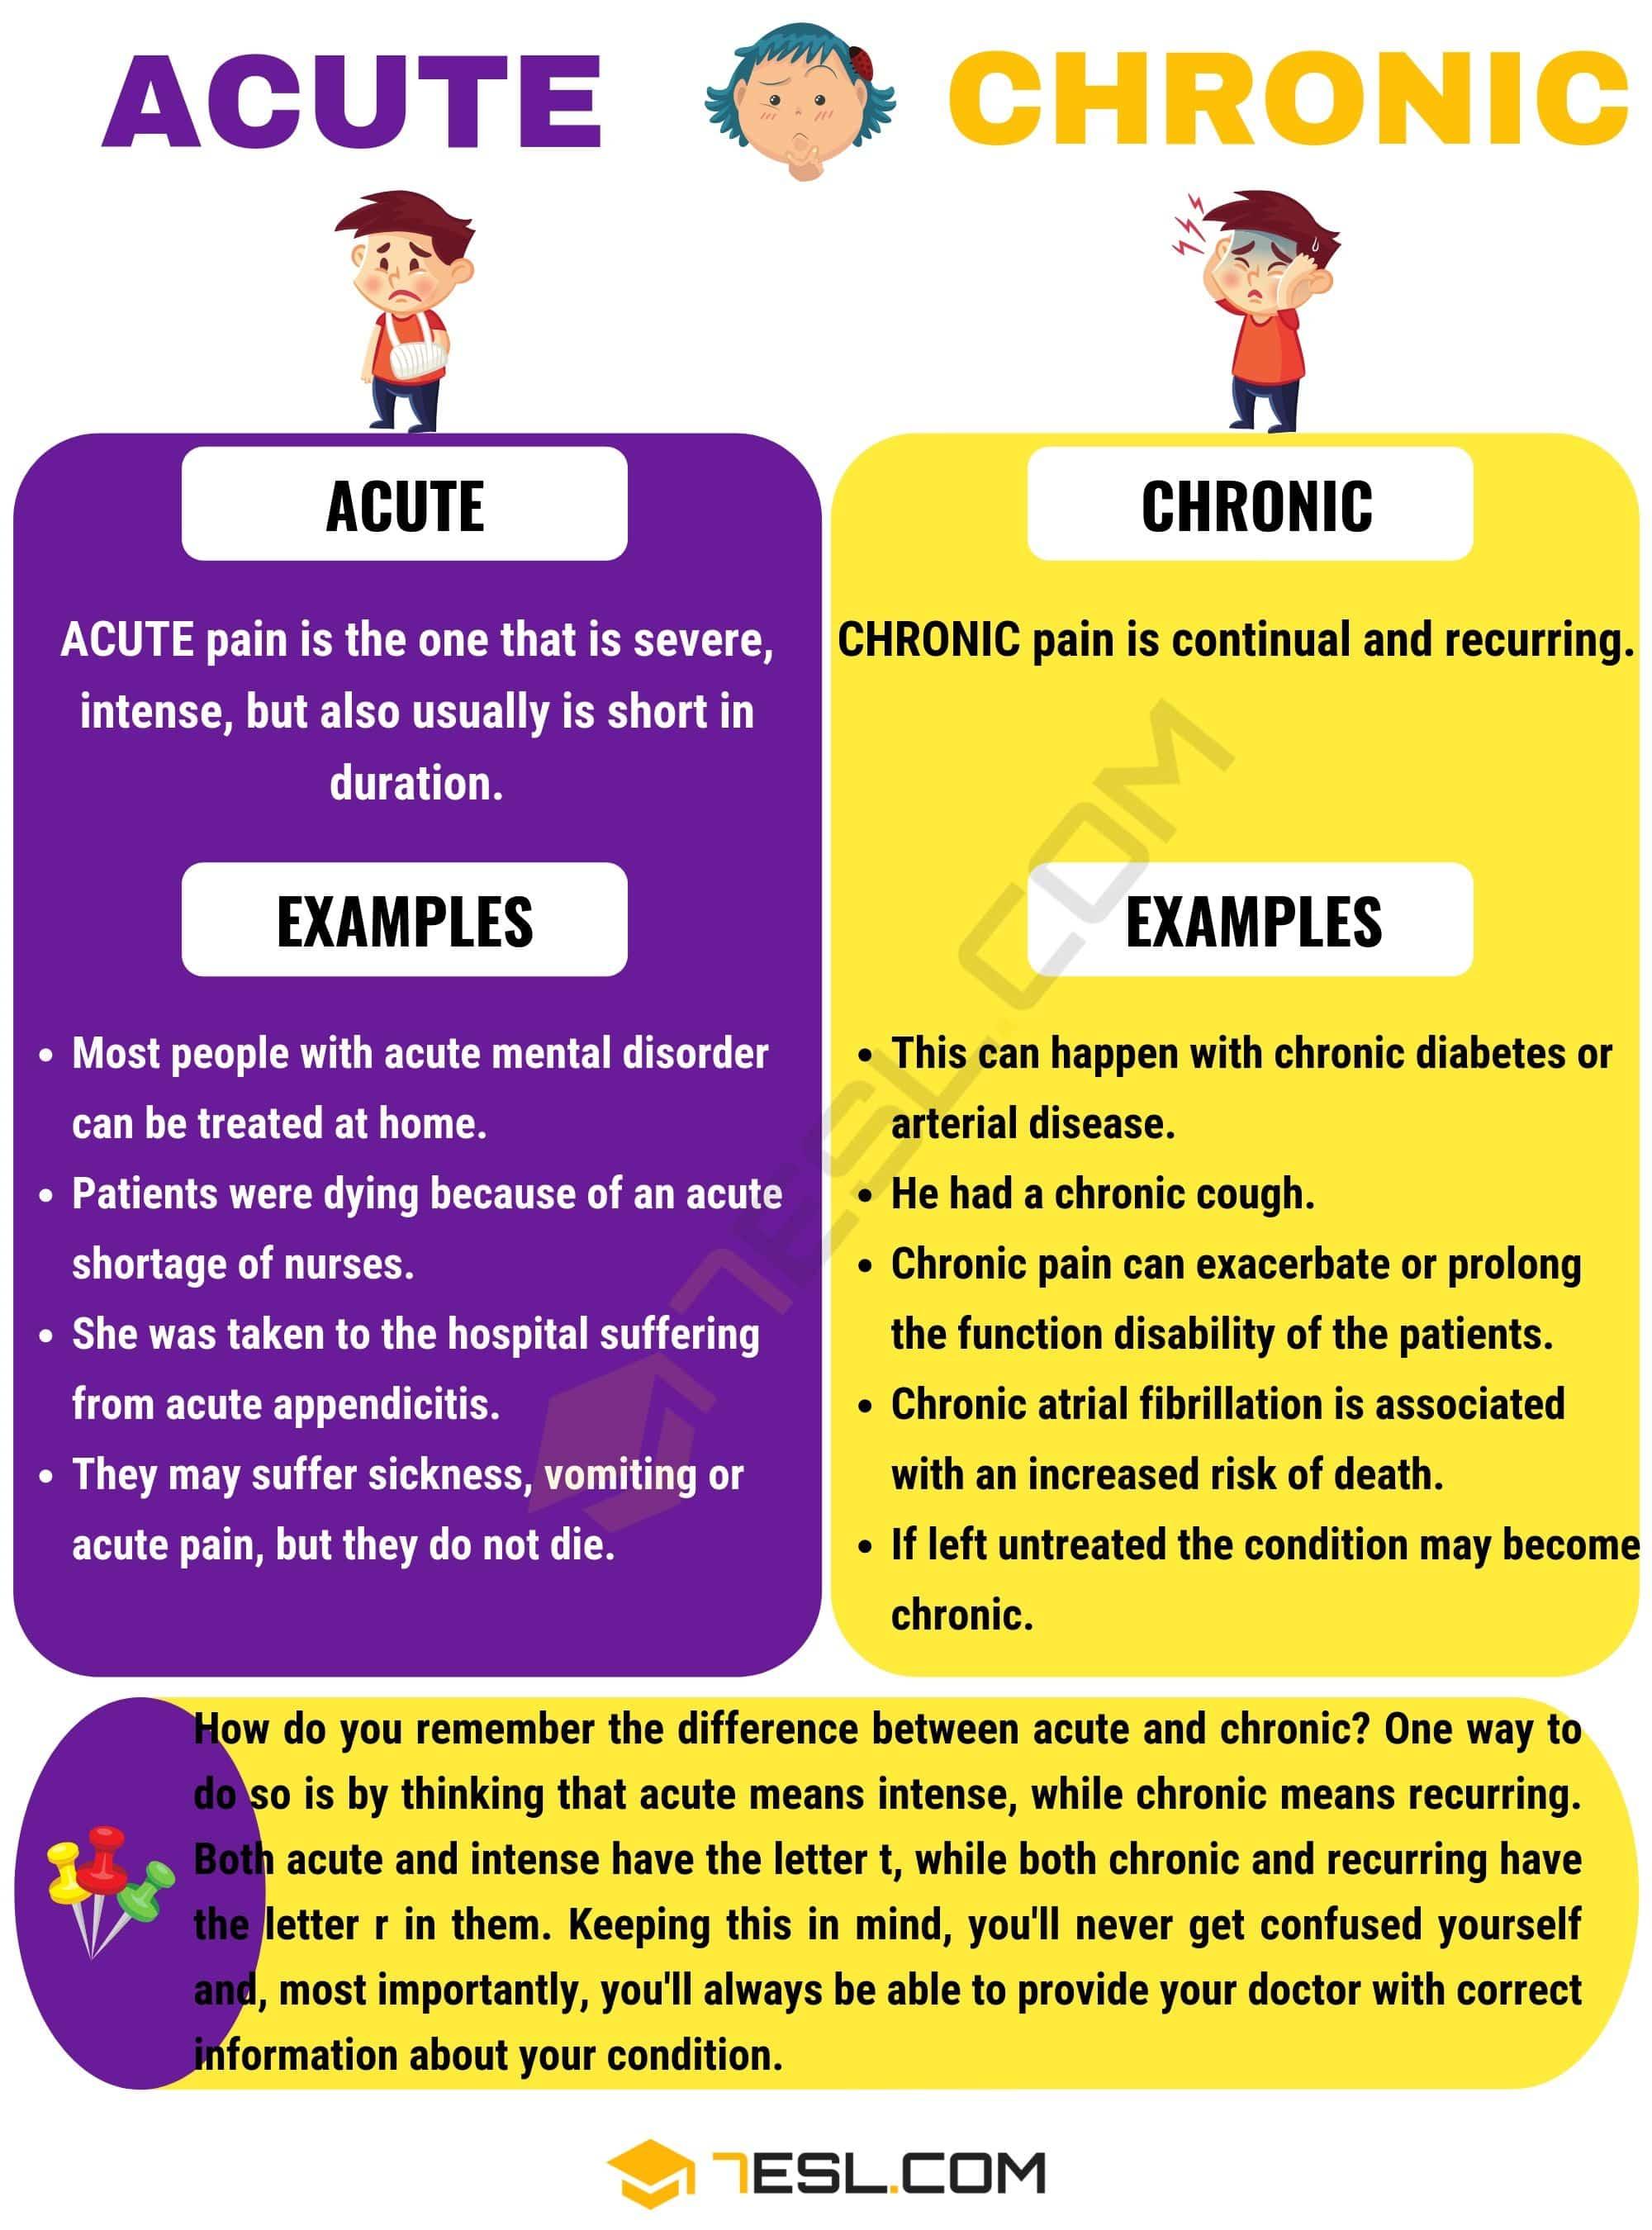 Acute vs Chronic